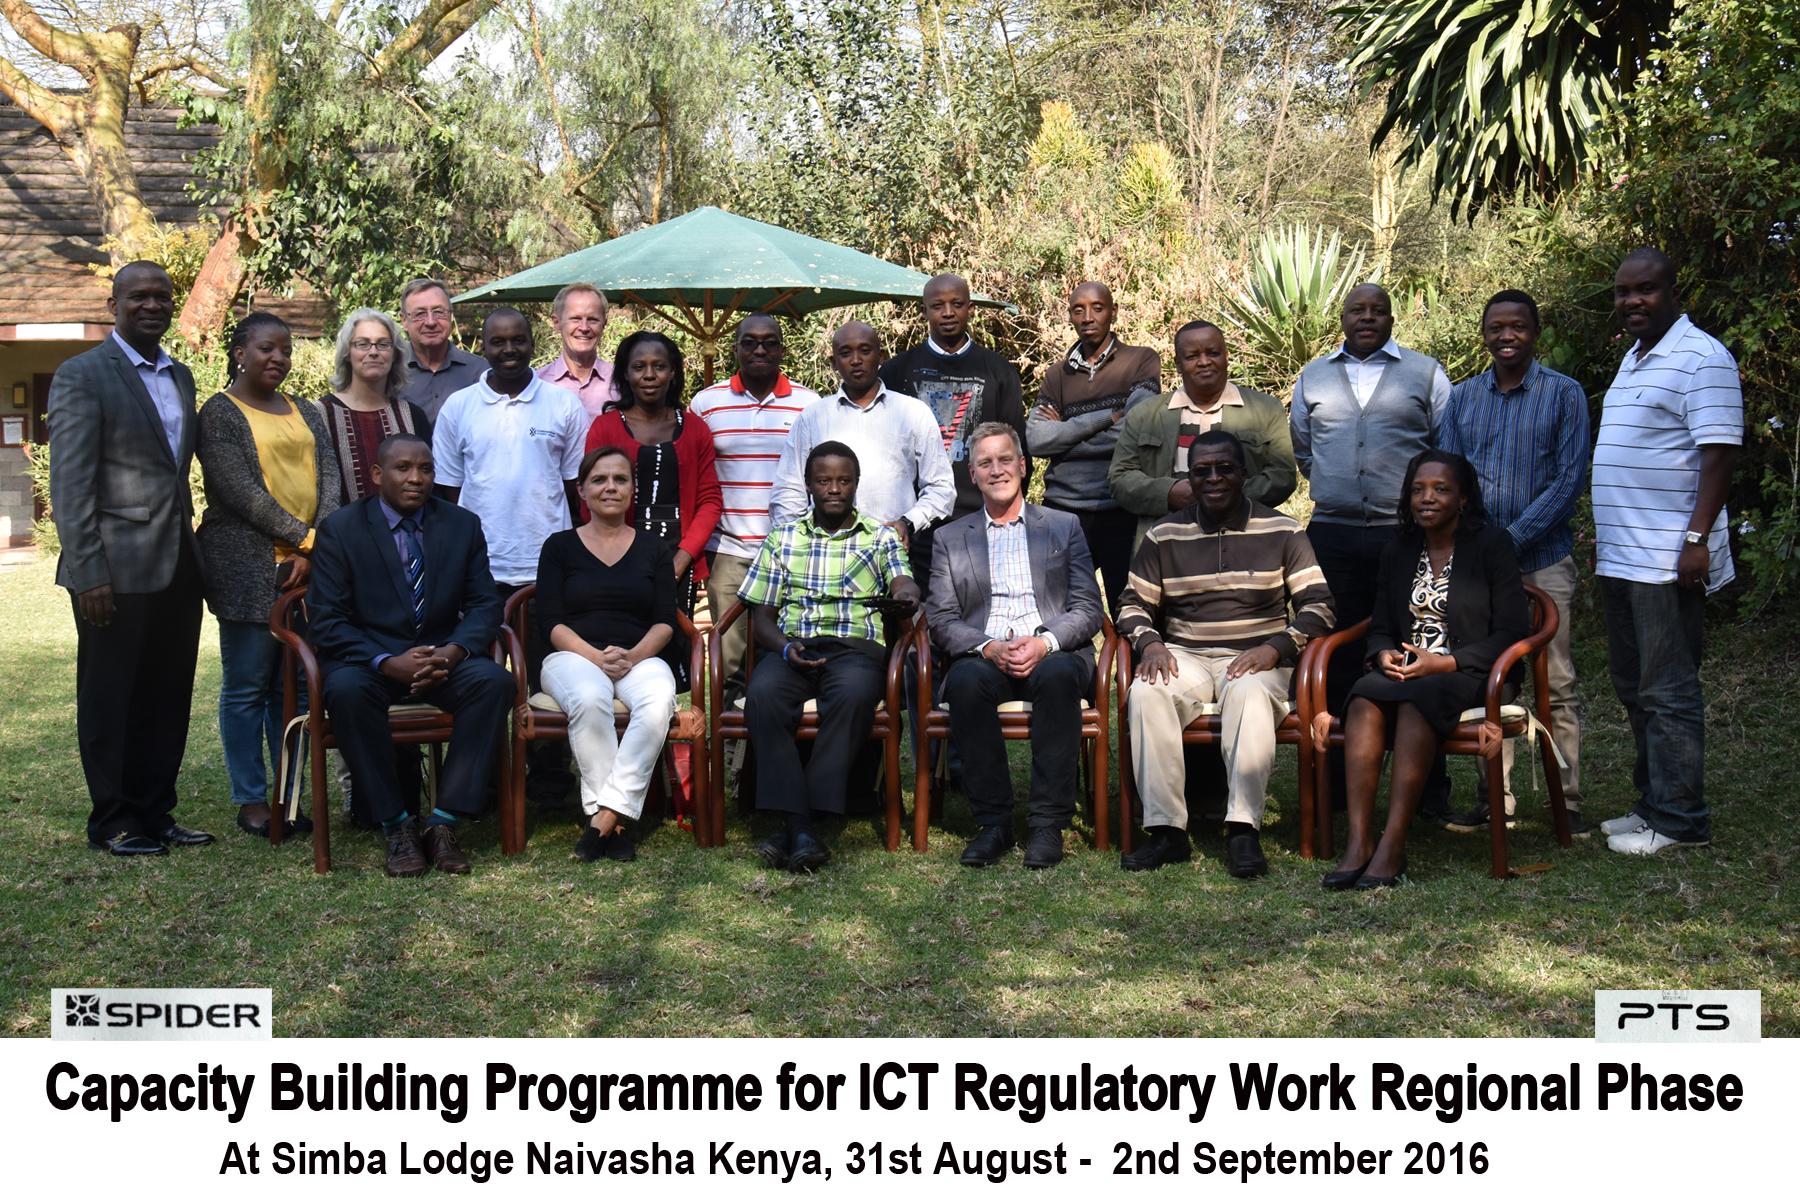 Group picture of pilot programme participants regional phase